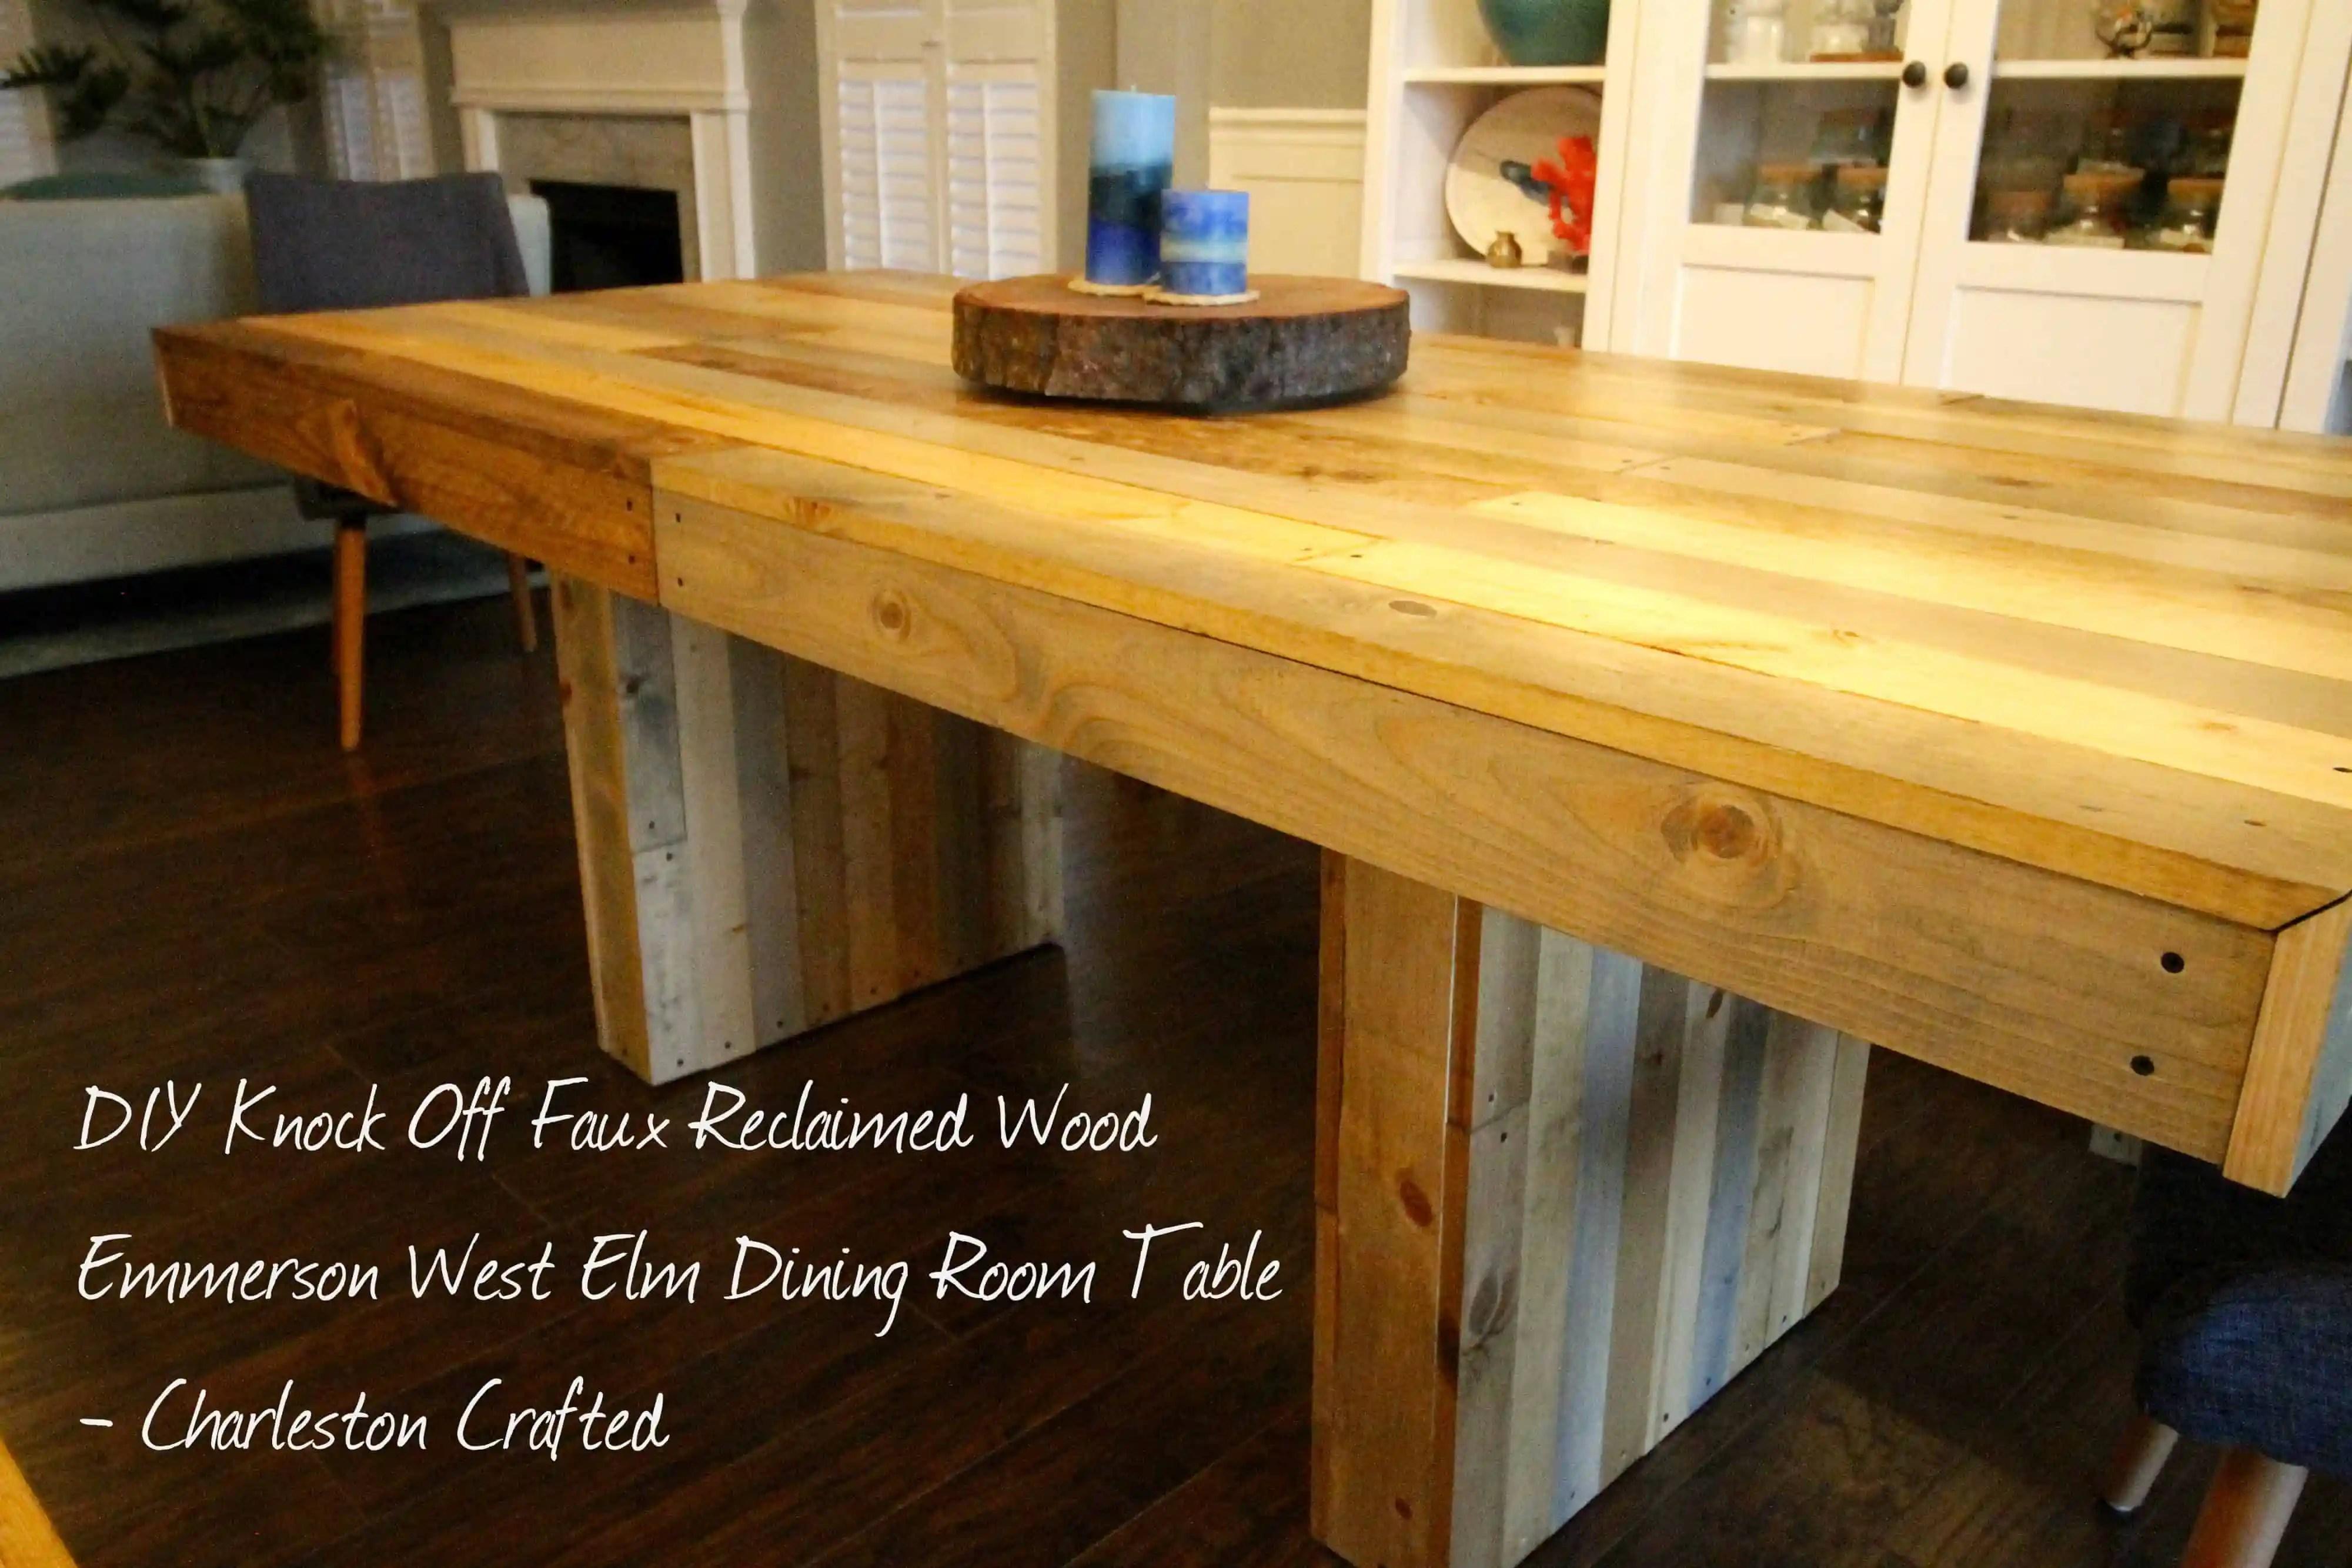 DIY Knock Off Faux Reclaimed Wood Emmerson West Elm Dining Room - Good wood furniture charleston sc